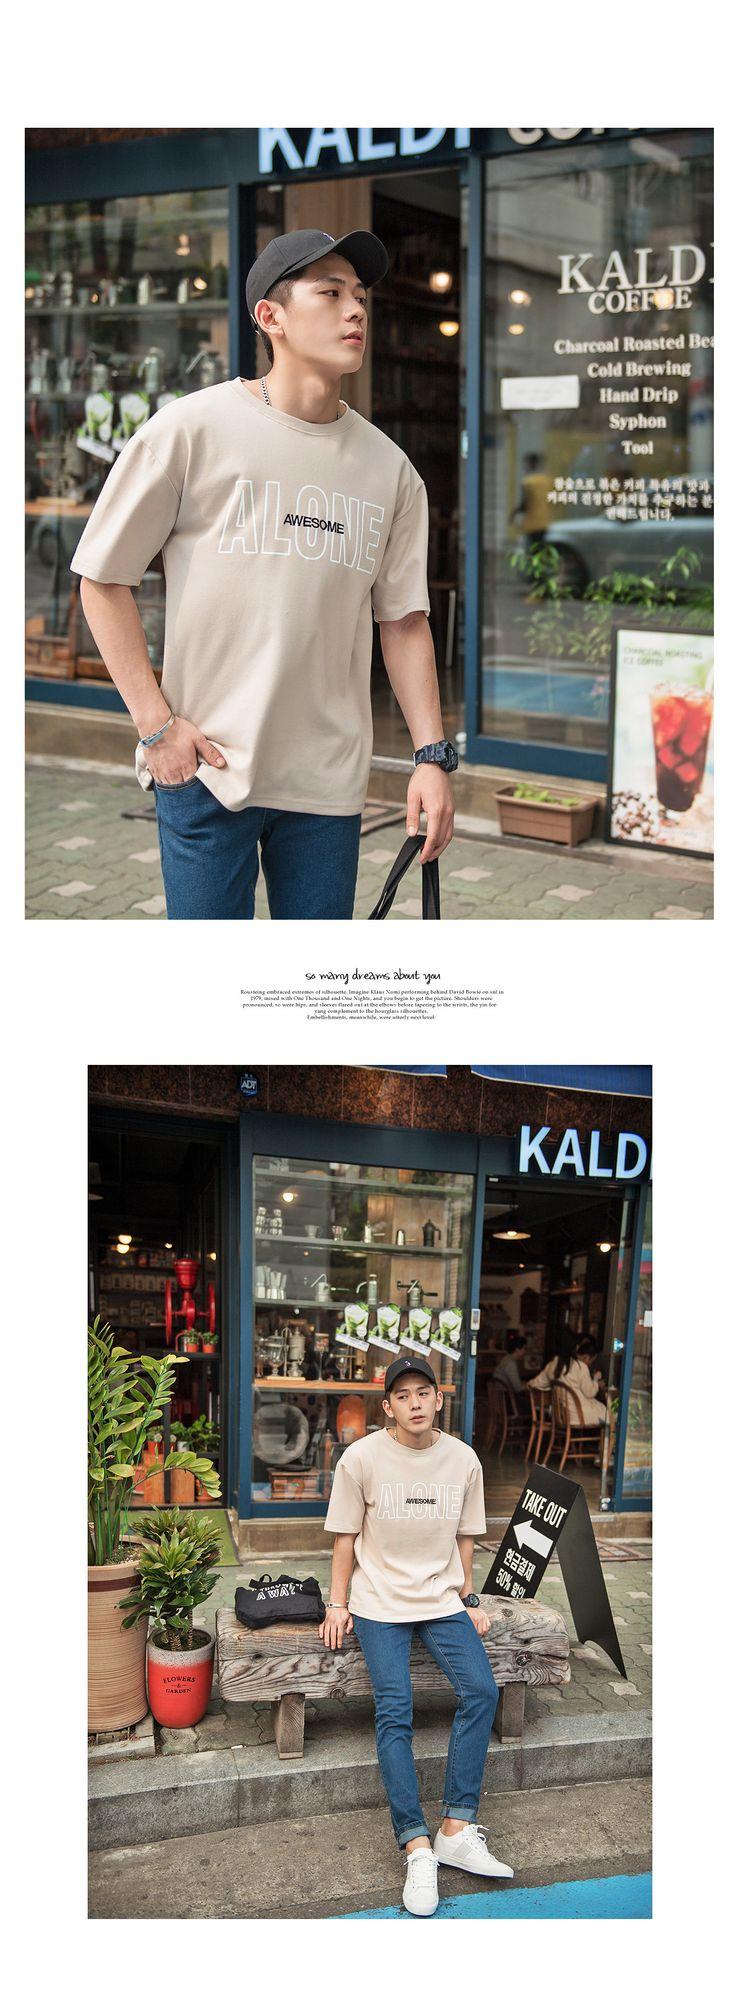 [[PN.03] 어썸 자수 나염 반팔 티셔츠] 남자반팔 남자티셔츠 남자패션 남자여름